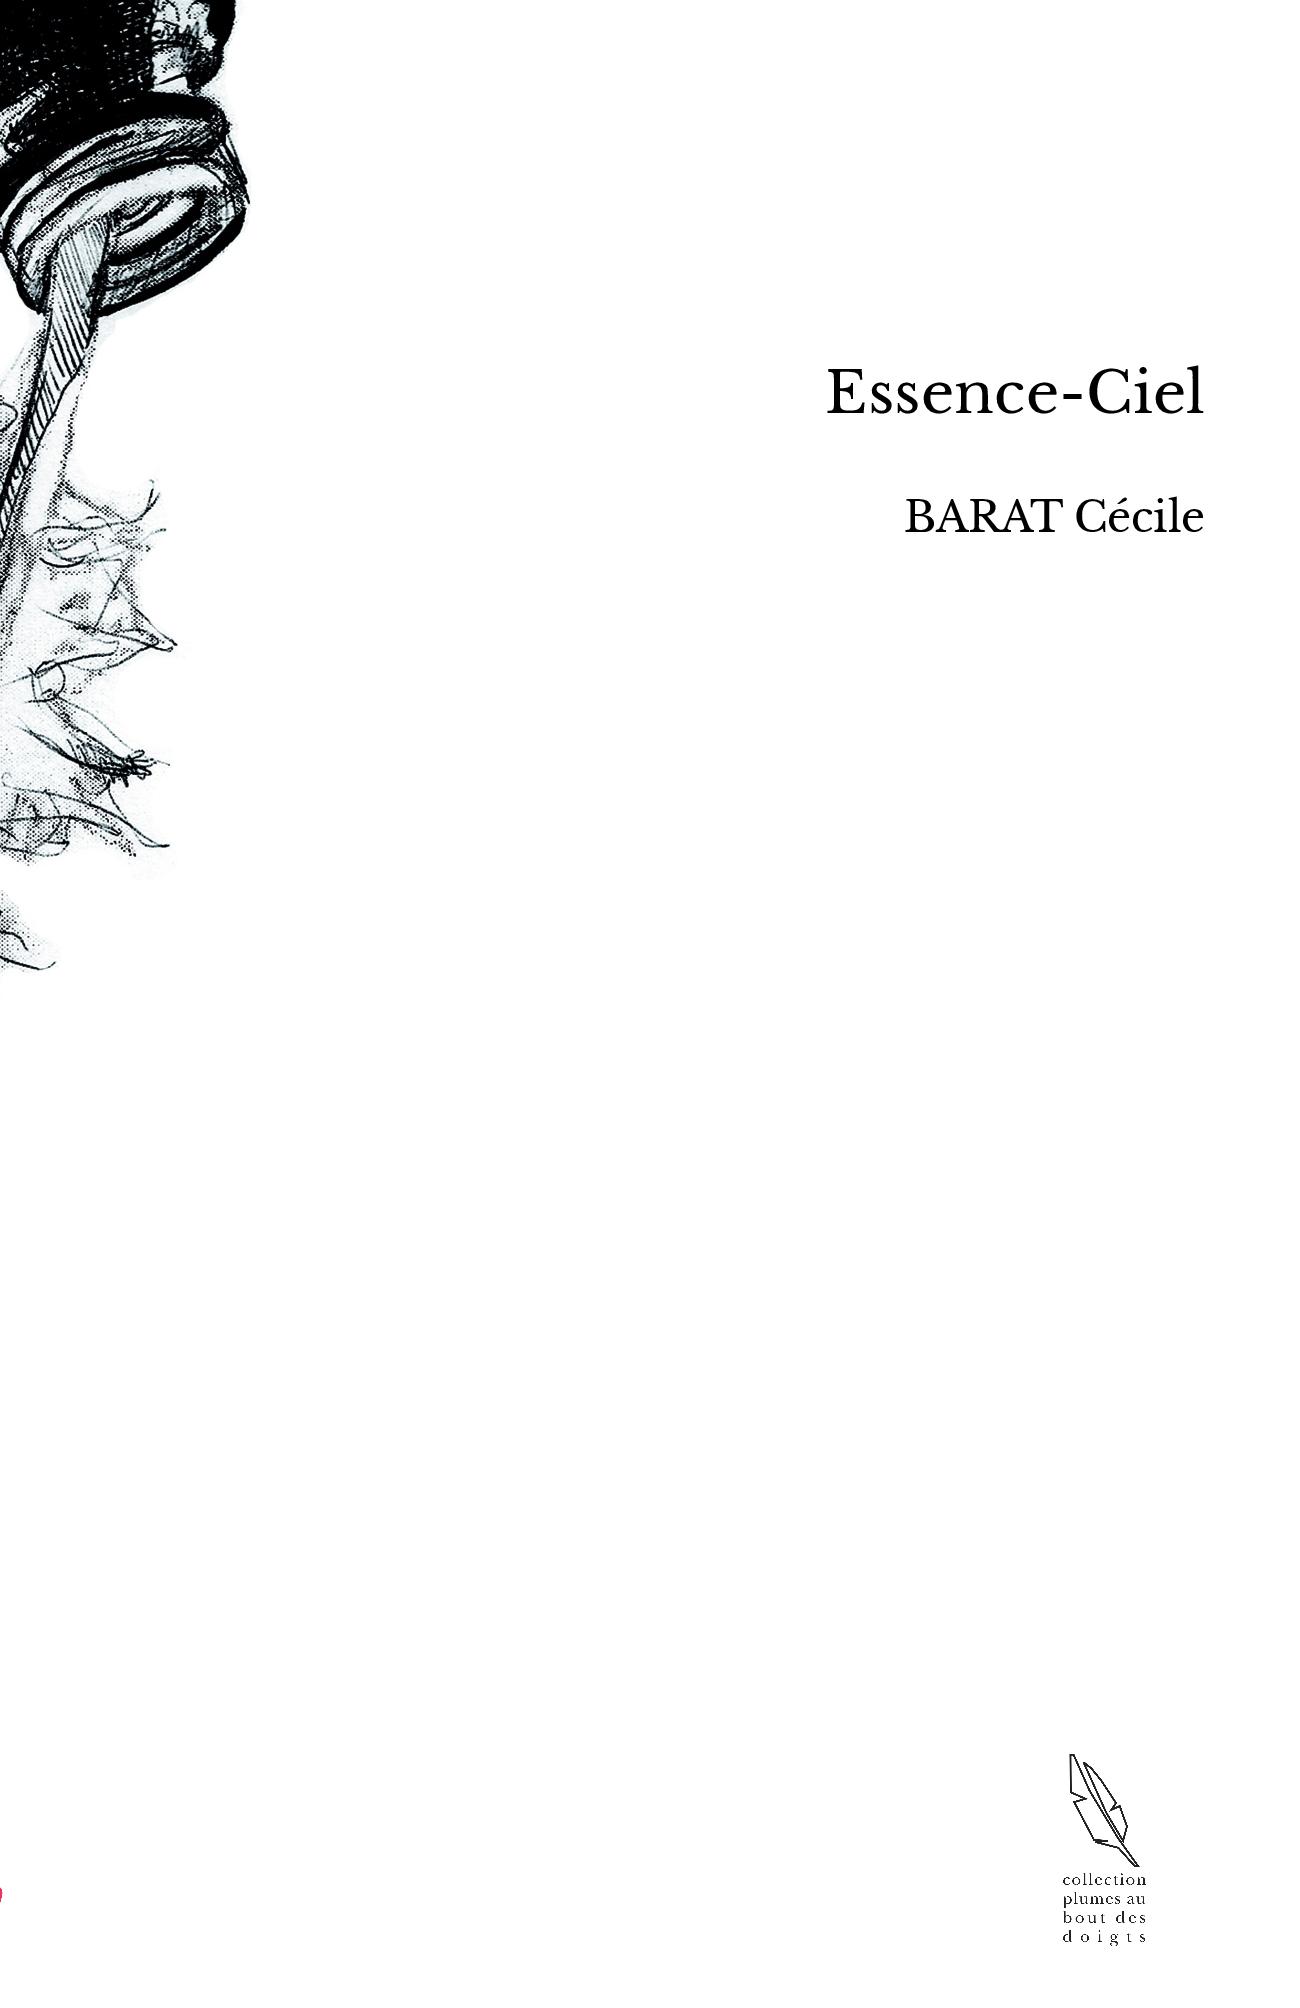 Essence-Ciel